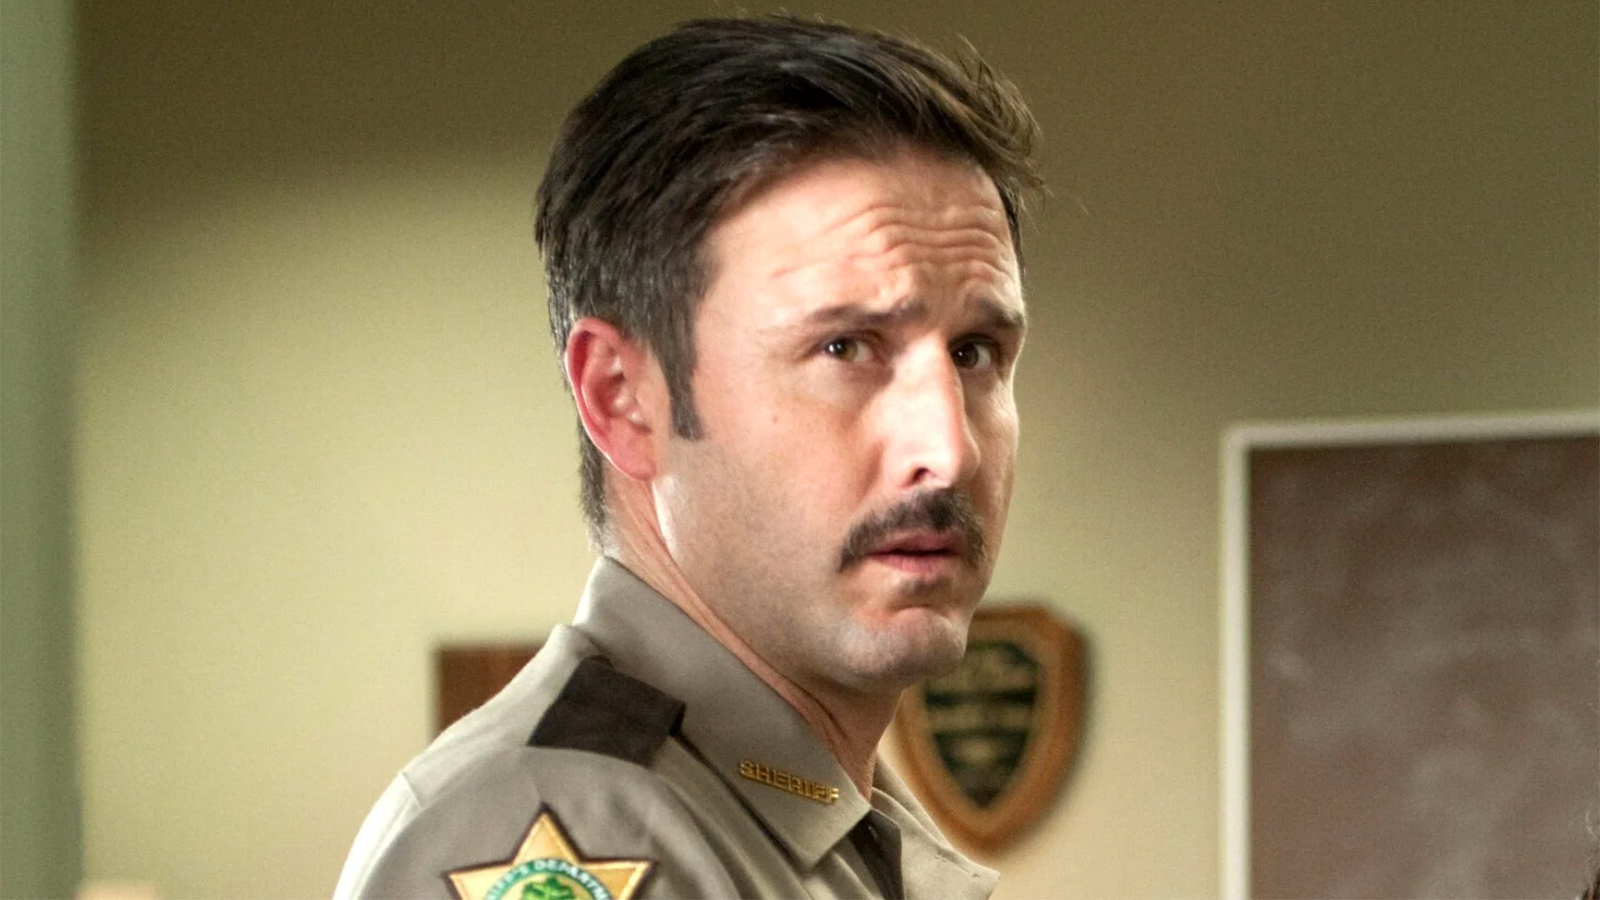 David Arquette as Dewey in Scream